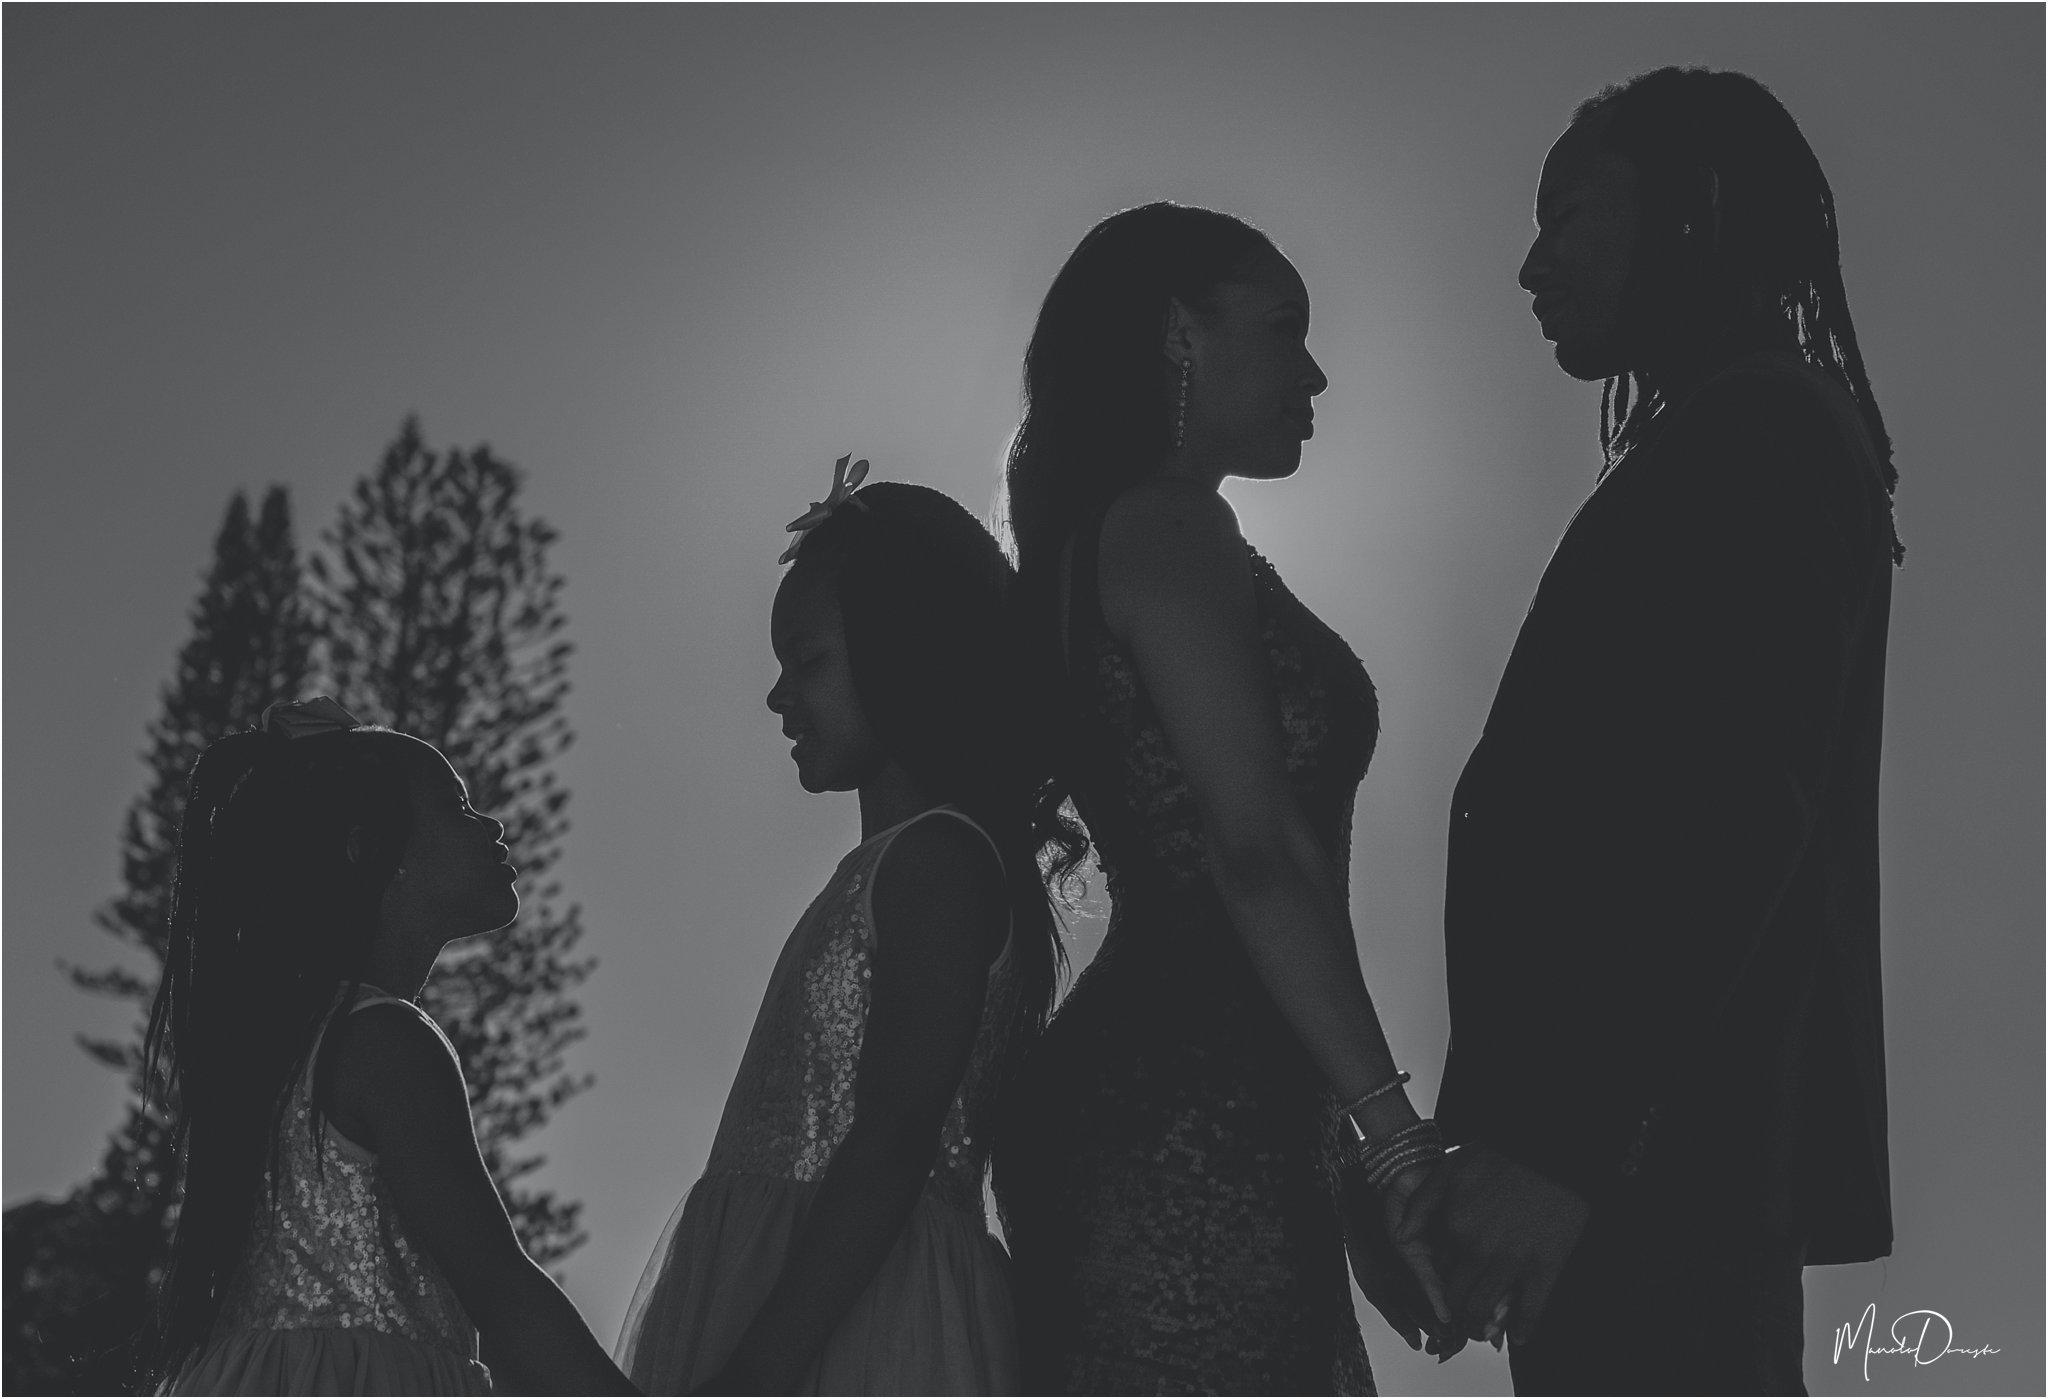 01012_ManoloDoreste_InFocusStudios_Wedding_Family_Photography_Miami_MiamiPhotographer.jpg